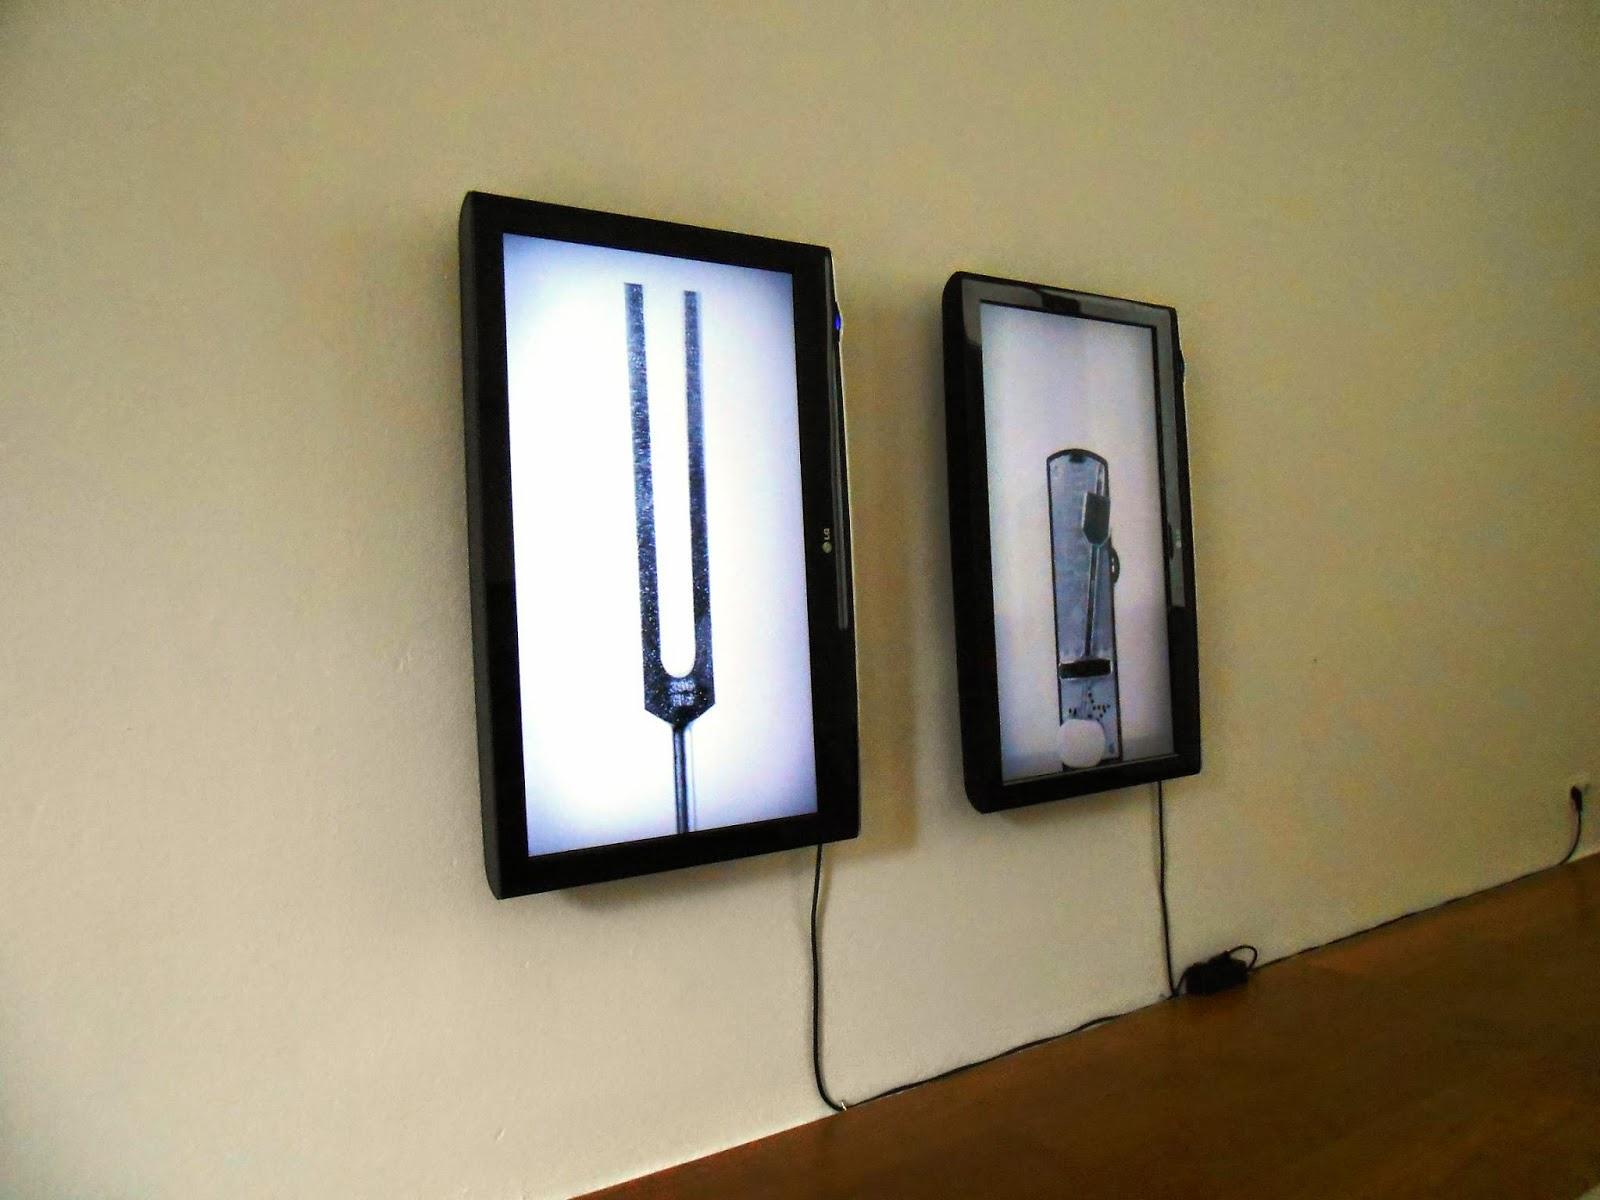 Espen Sommer Eide '396Hz at 2000 frames/s – 88BPM at 1000 frames/s' (2013) at Marres House, Maastricht